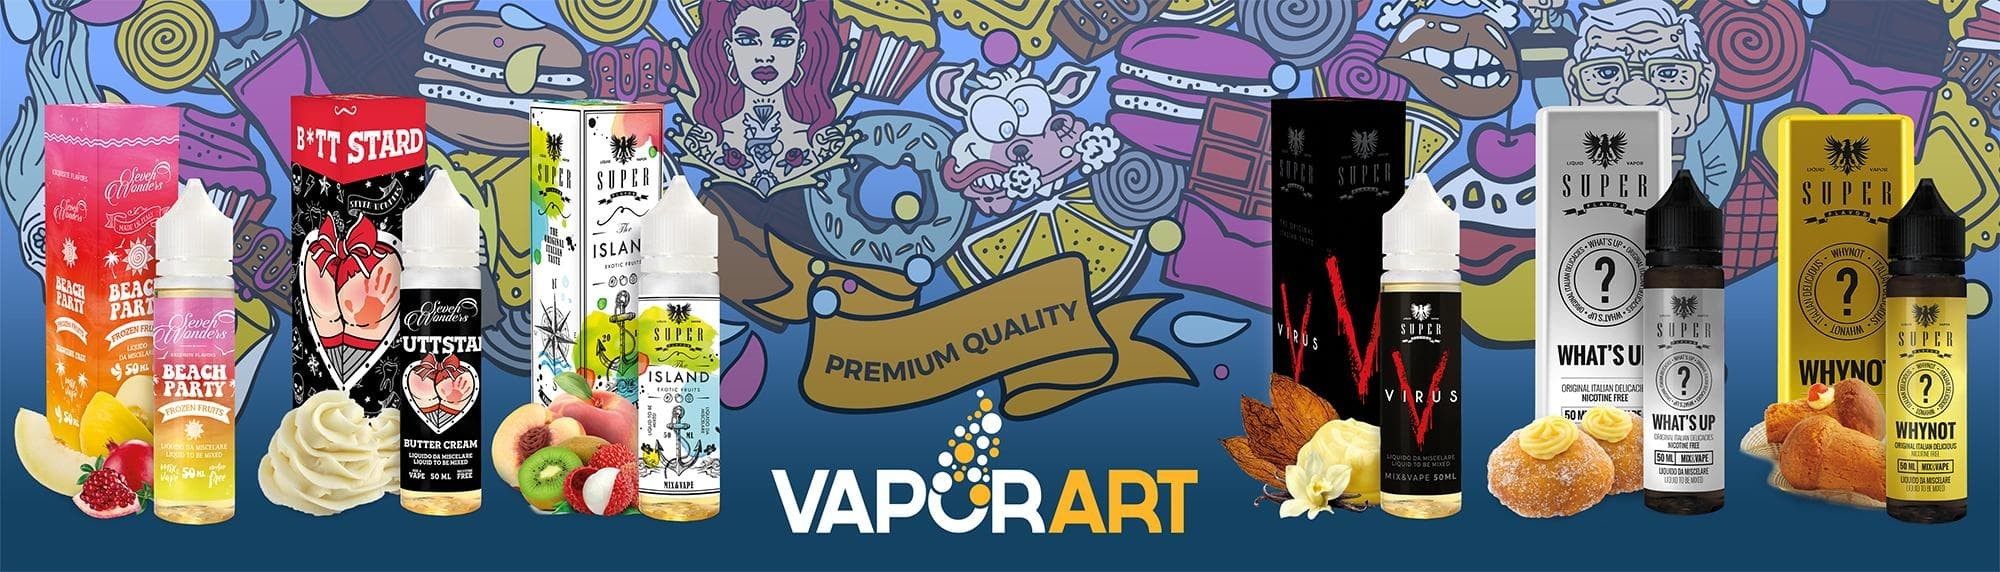 Comprar VaporArt líquidos para vapear precio barato